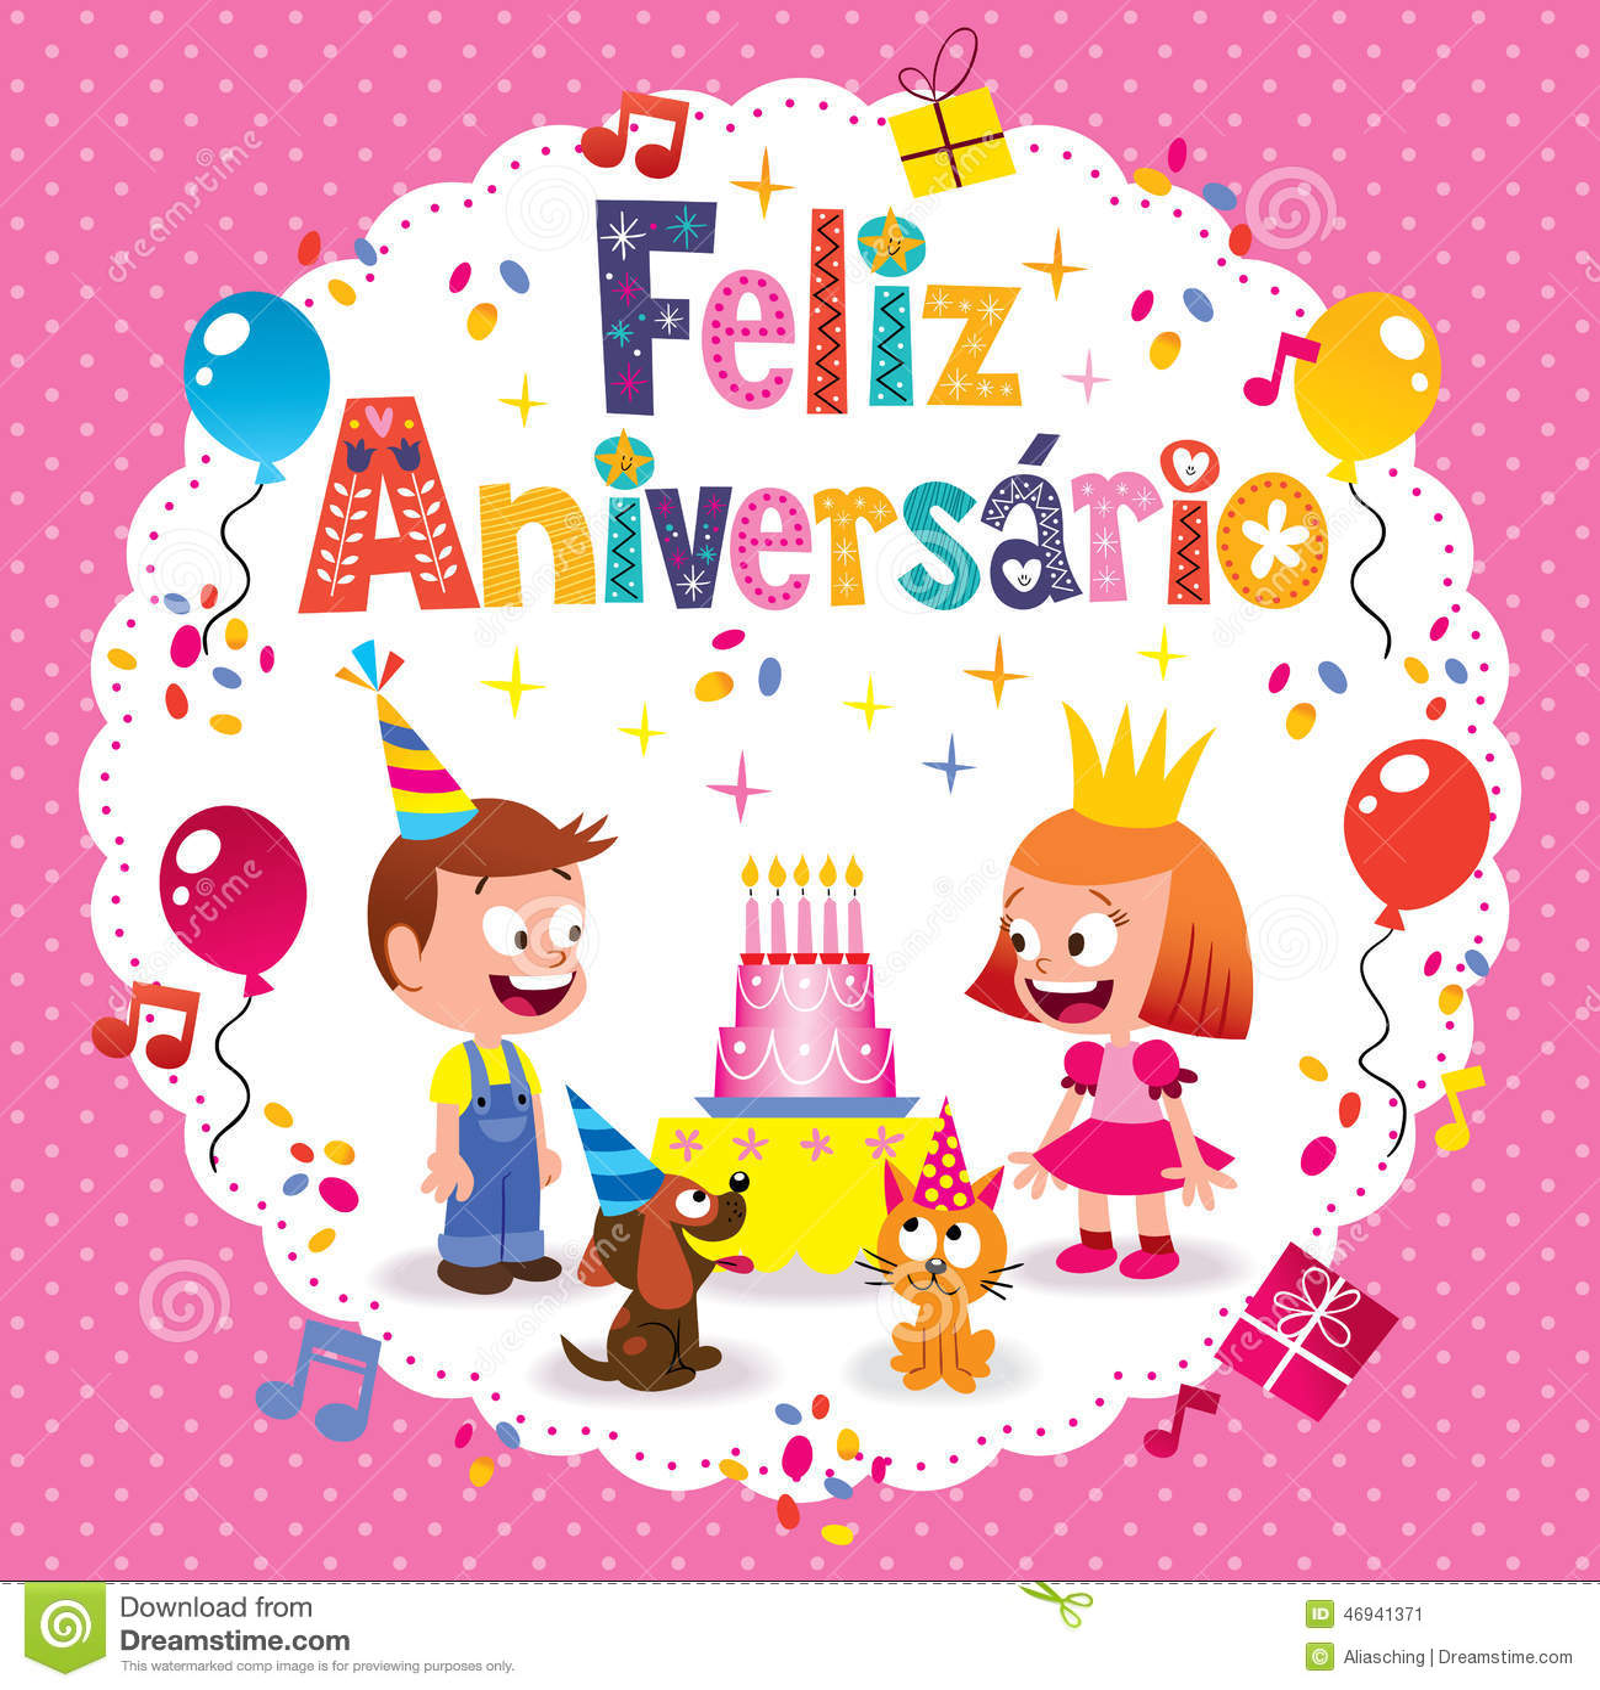 Feliz Aniversario Brazilian Portuguese Happy Birthday Card – Portuguese Birthday Cards